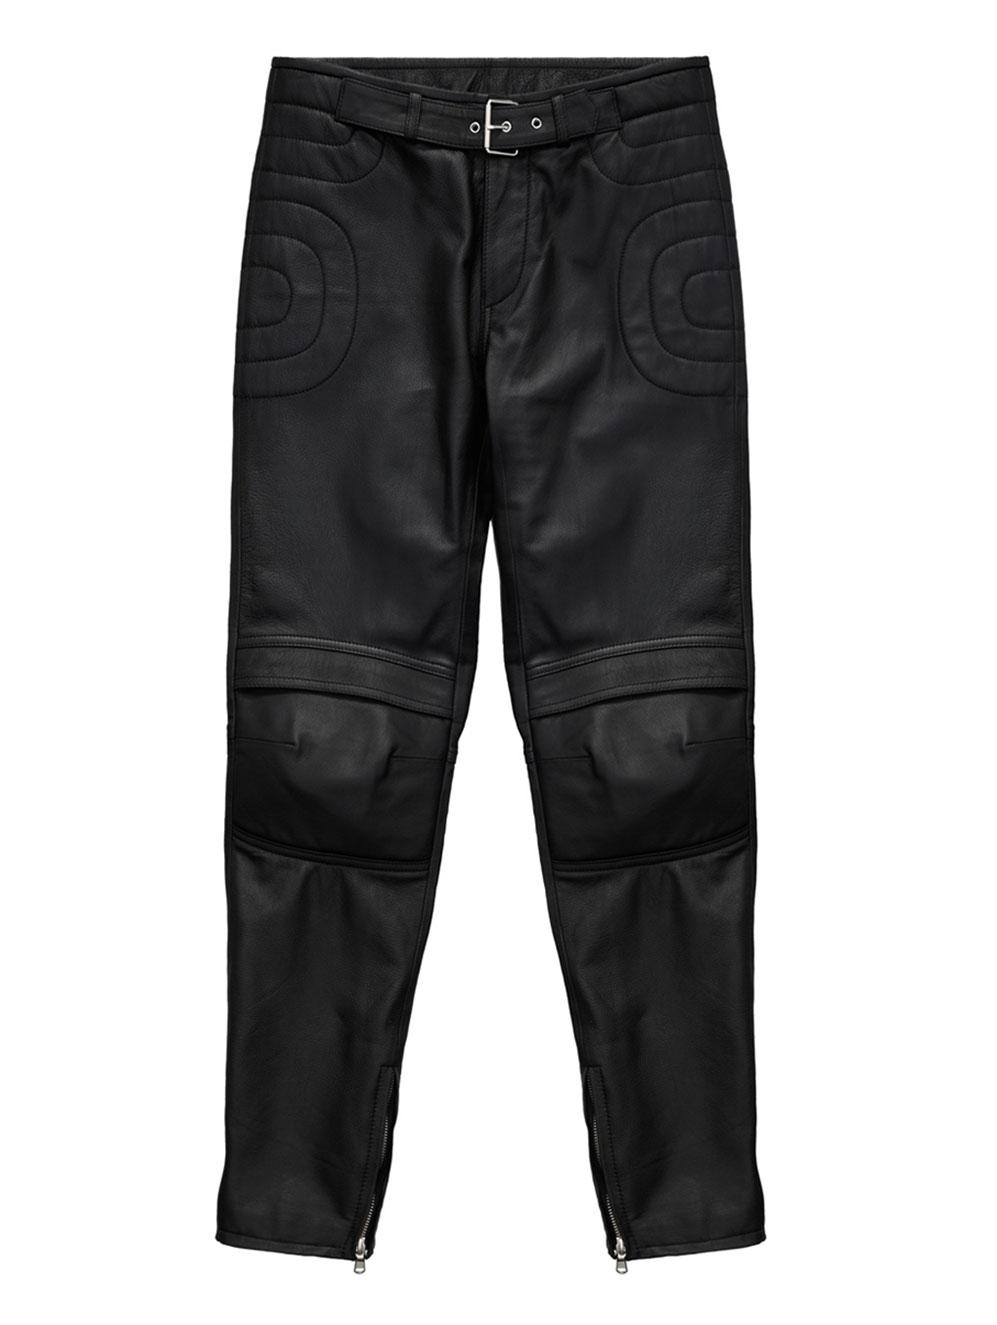 Svarta skinnbyxor Moschino x H&M